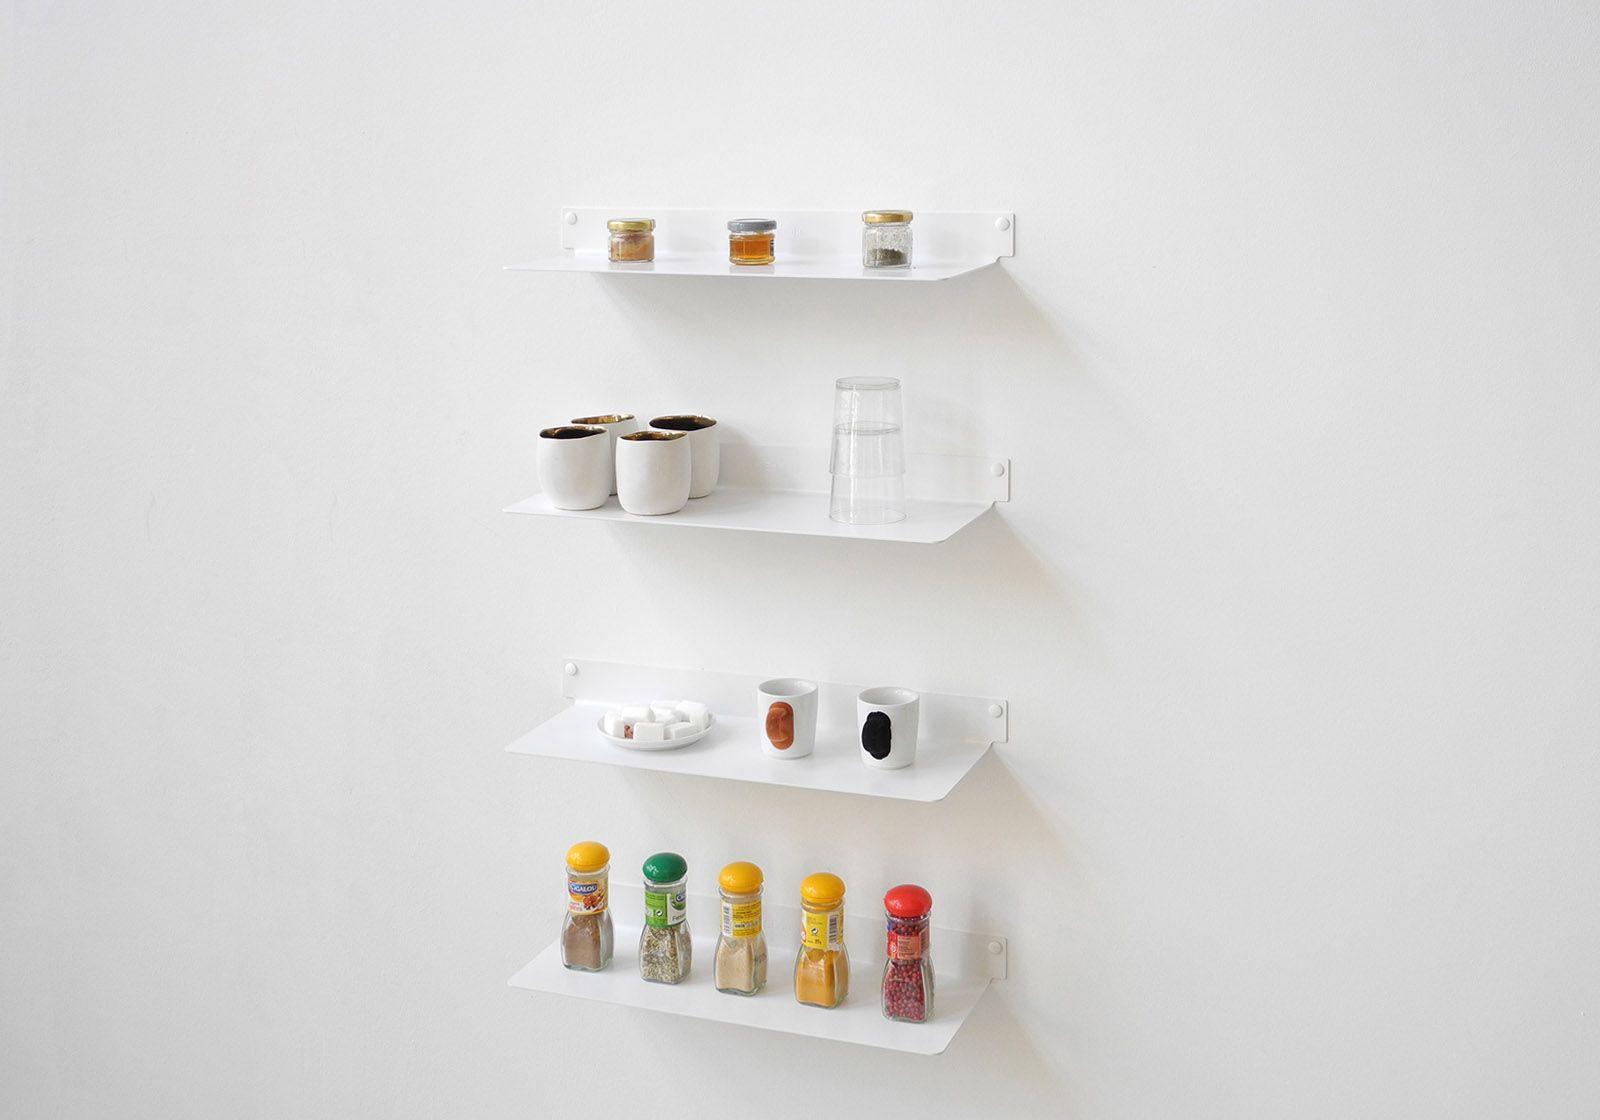 kitchen shelves teeline 4515 set of 4 - Kitchen Shelves